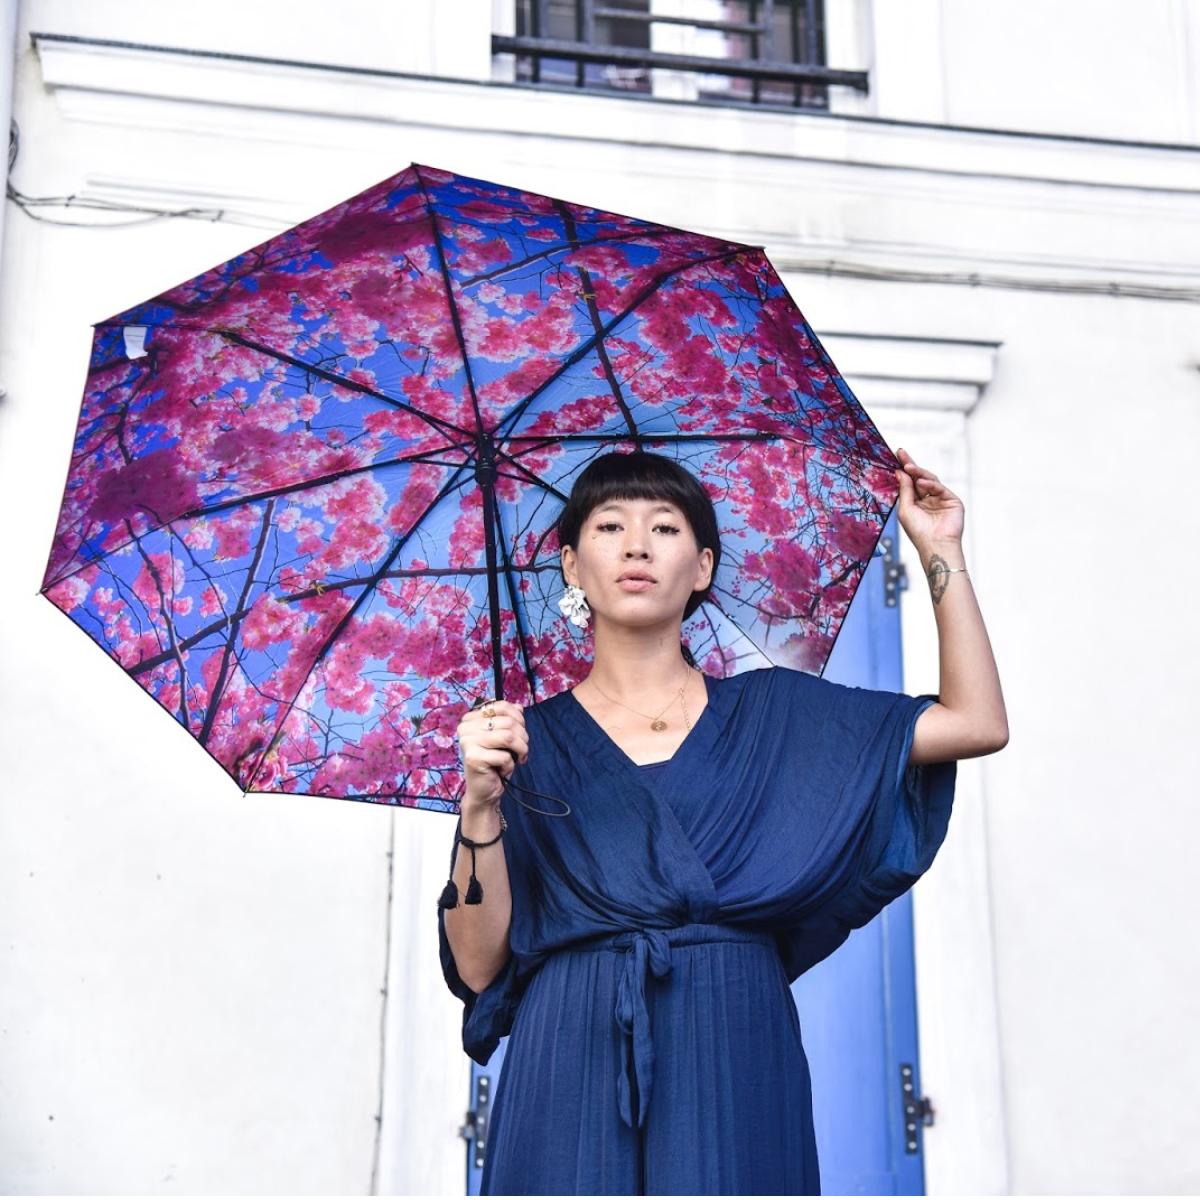 Cherry Regenschirm von HappySweeds (9)